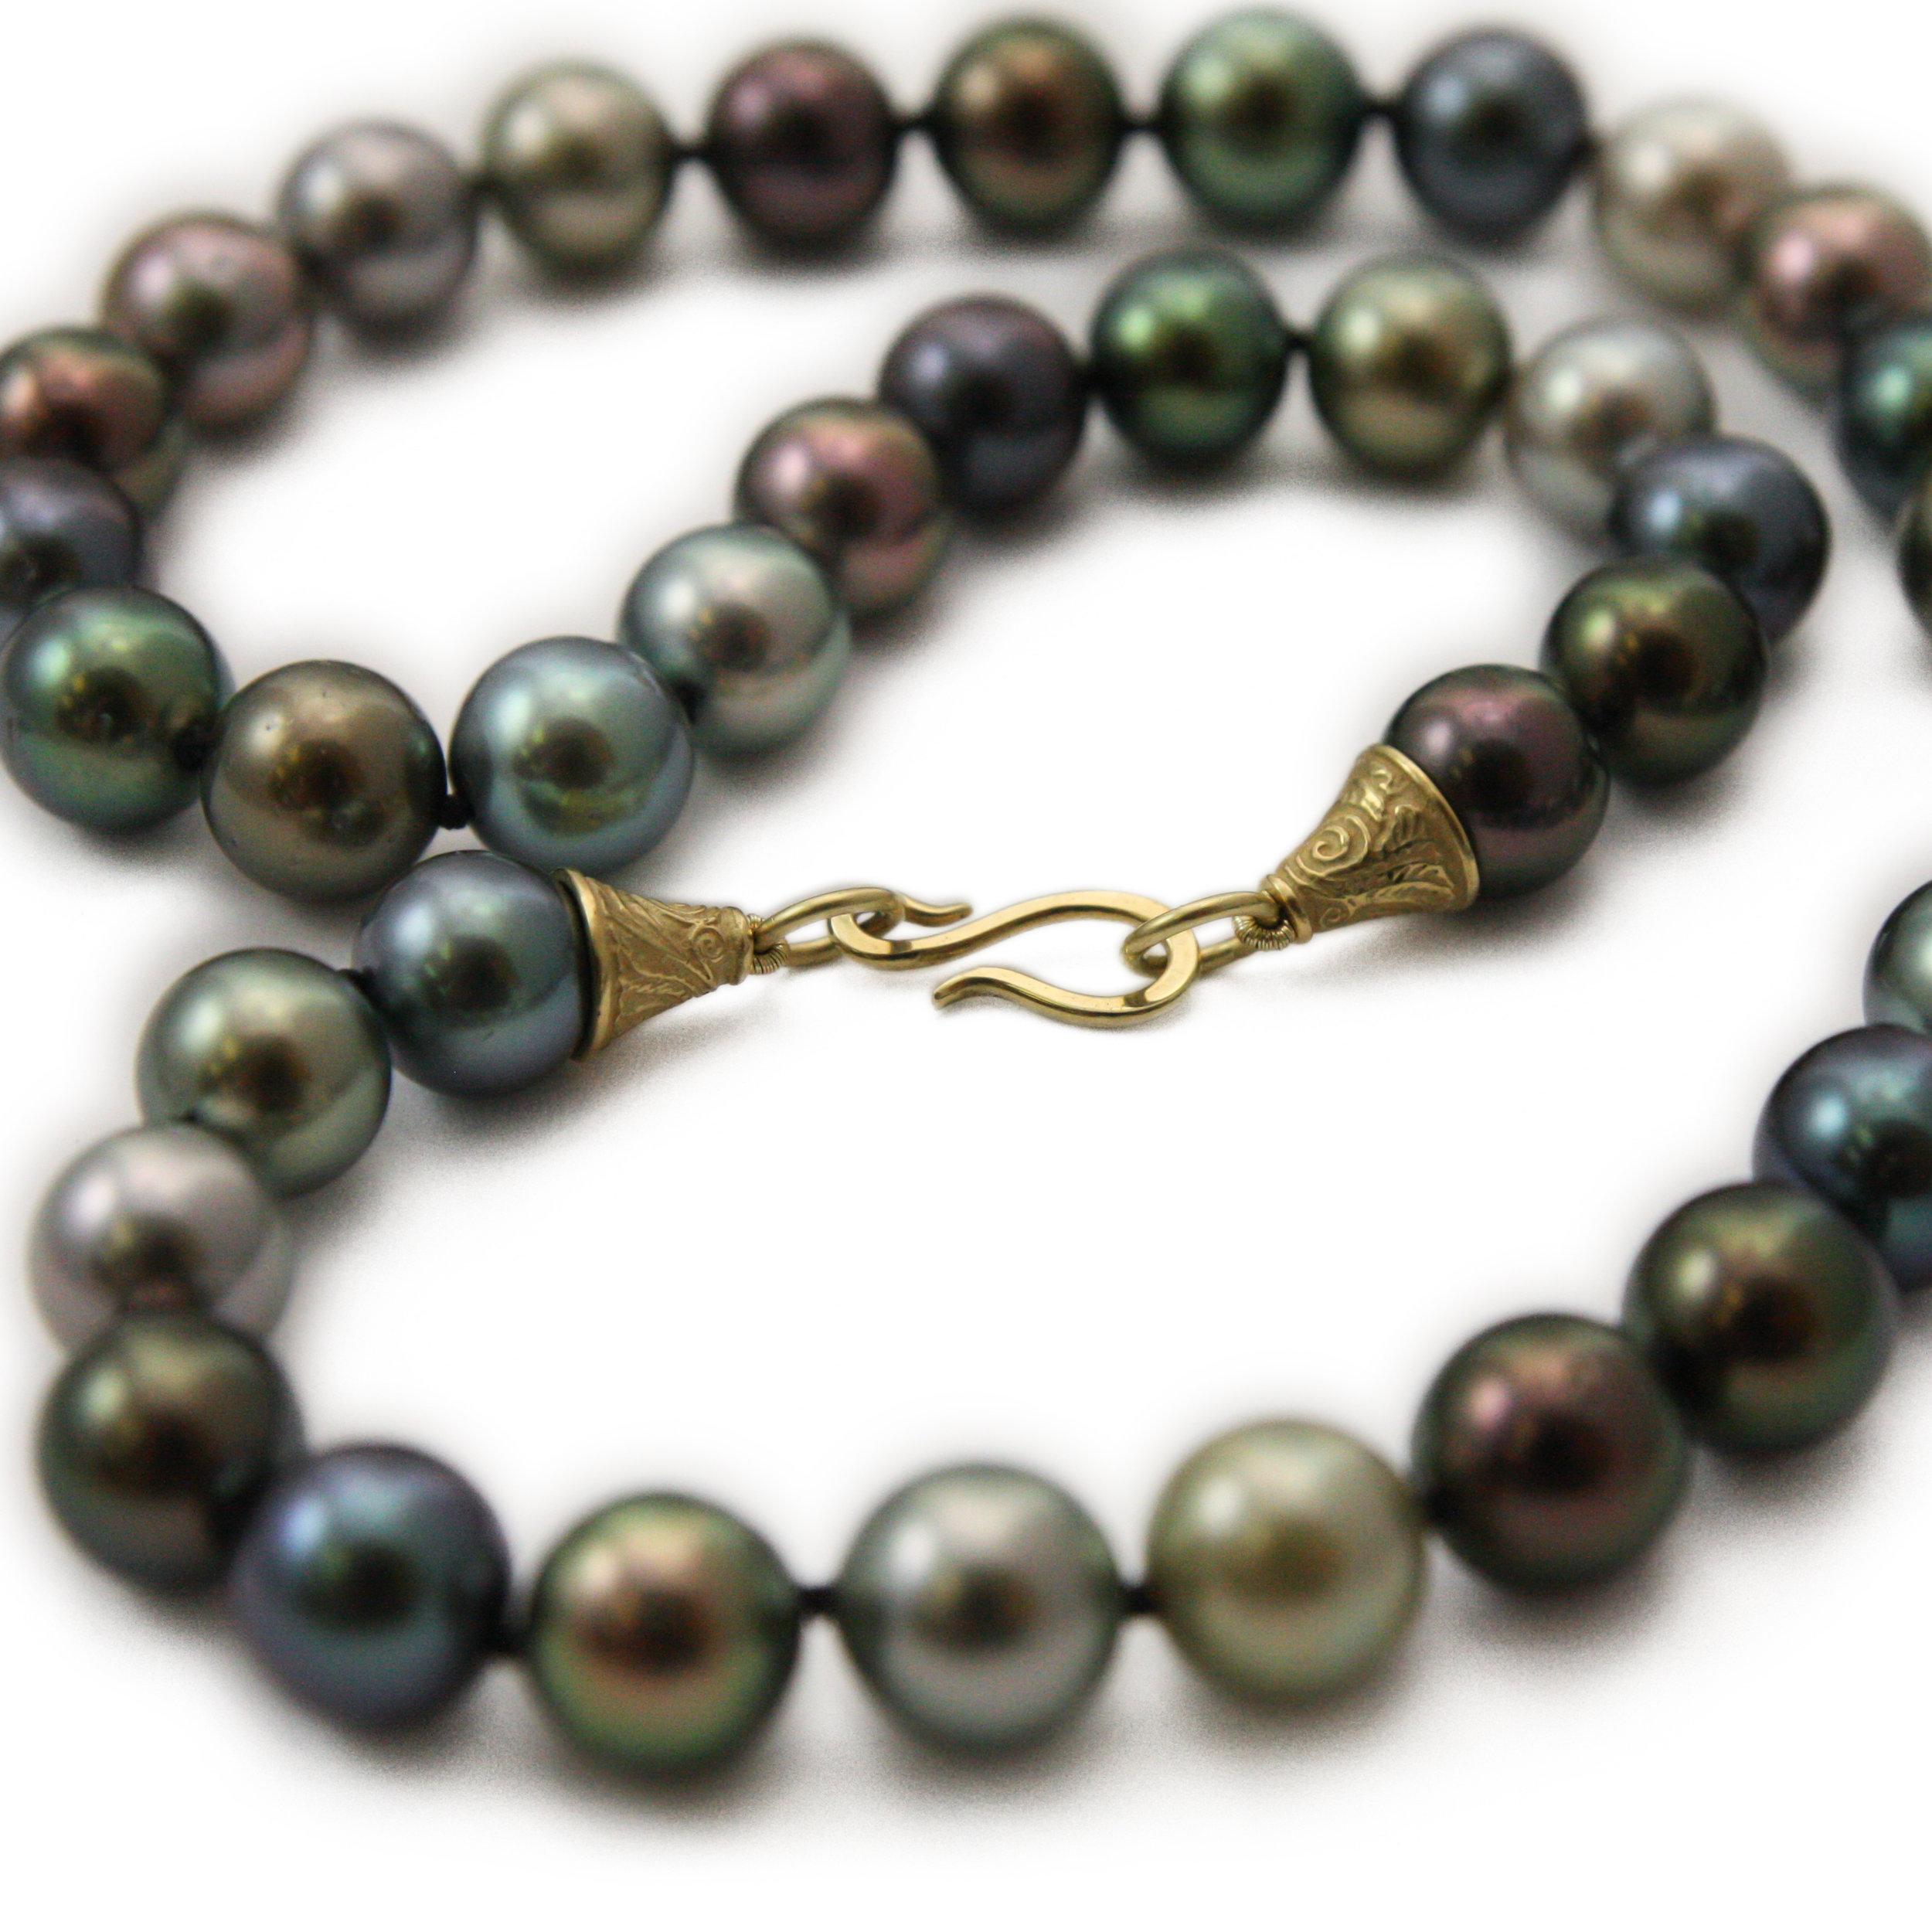 PATTERN tahitian necklace swirled EDITED.jpg